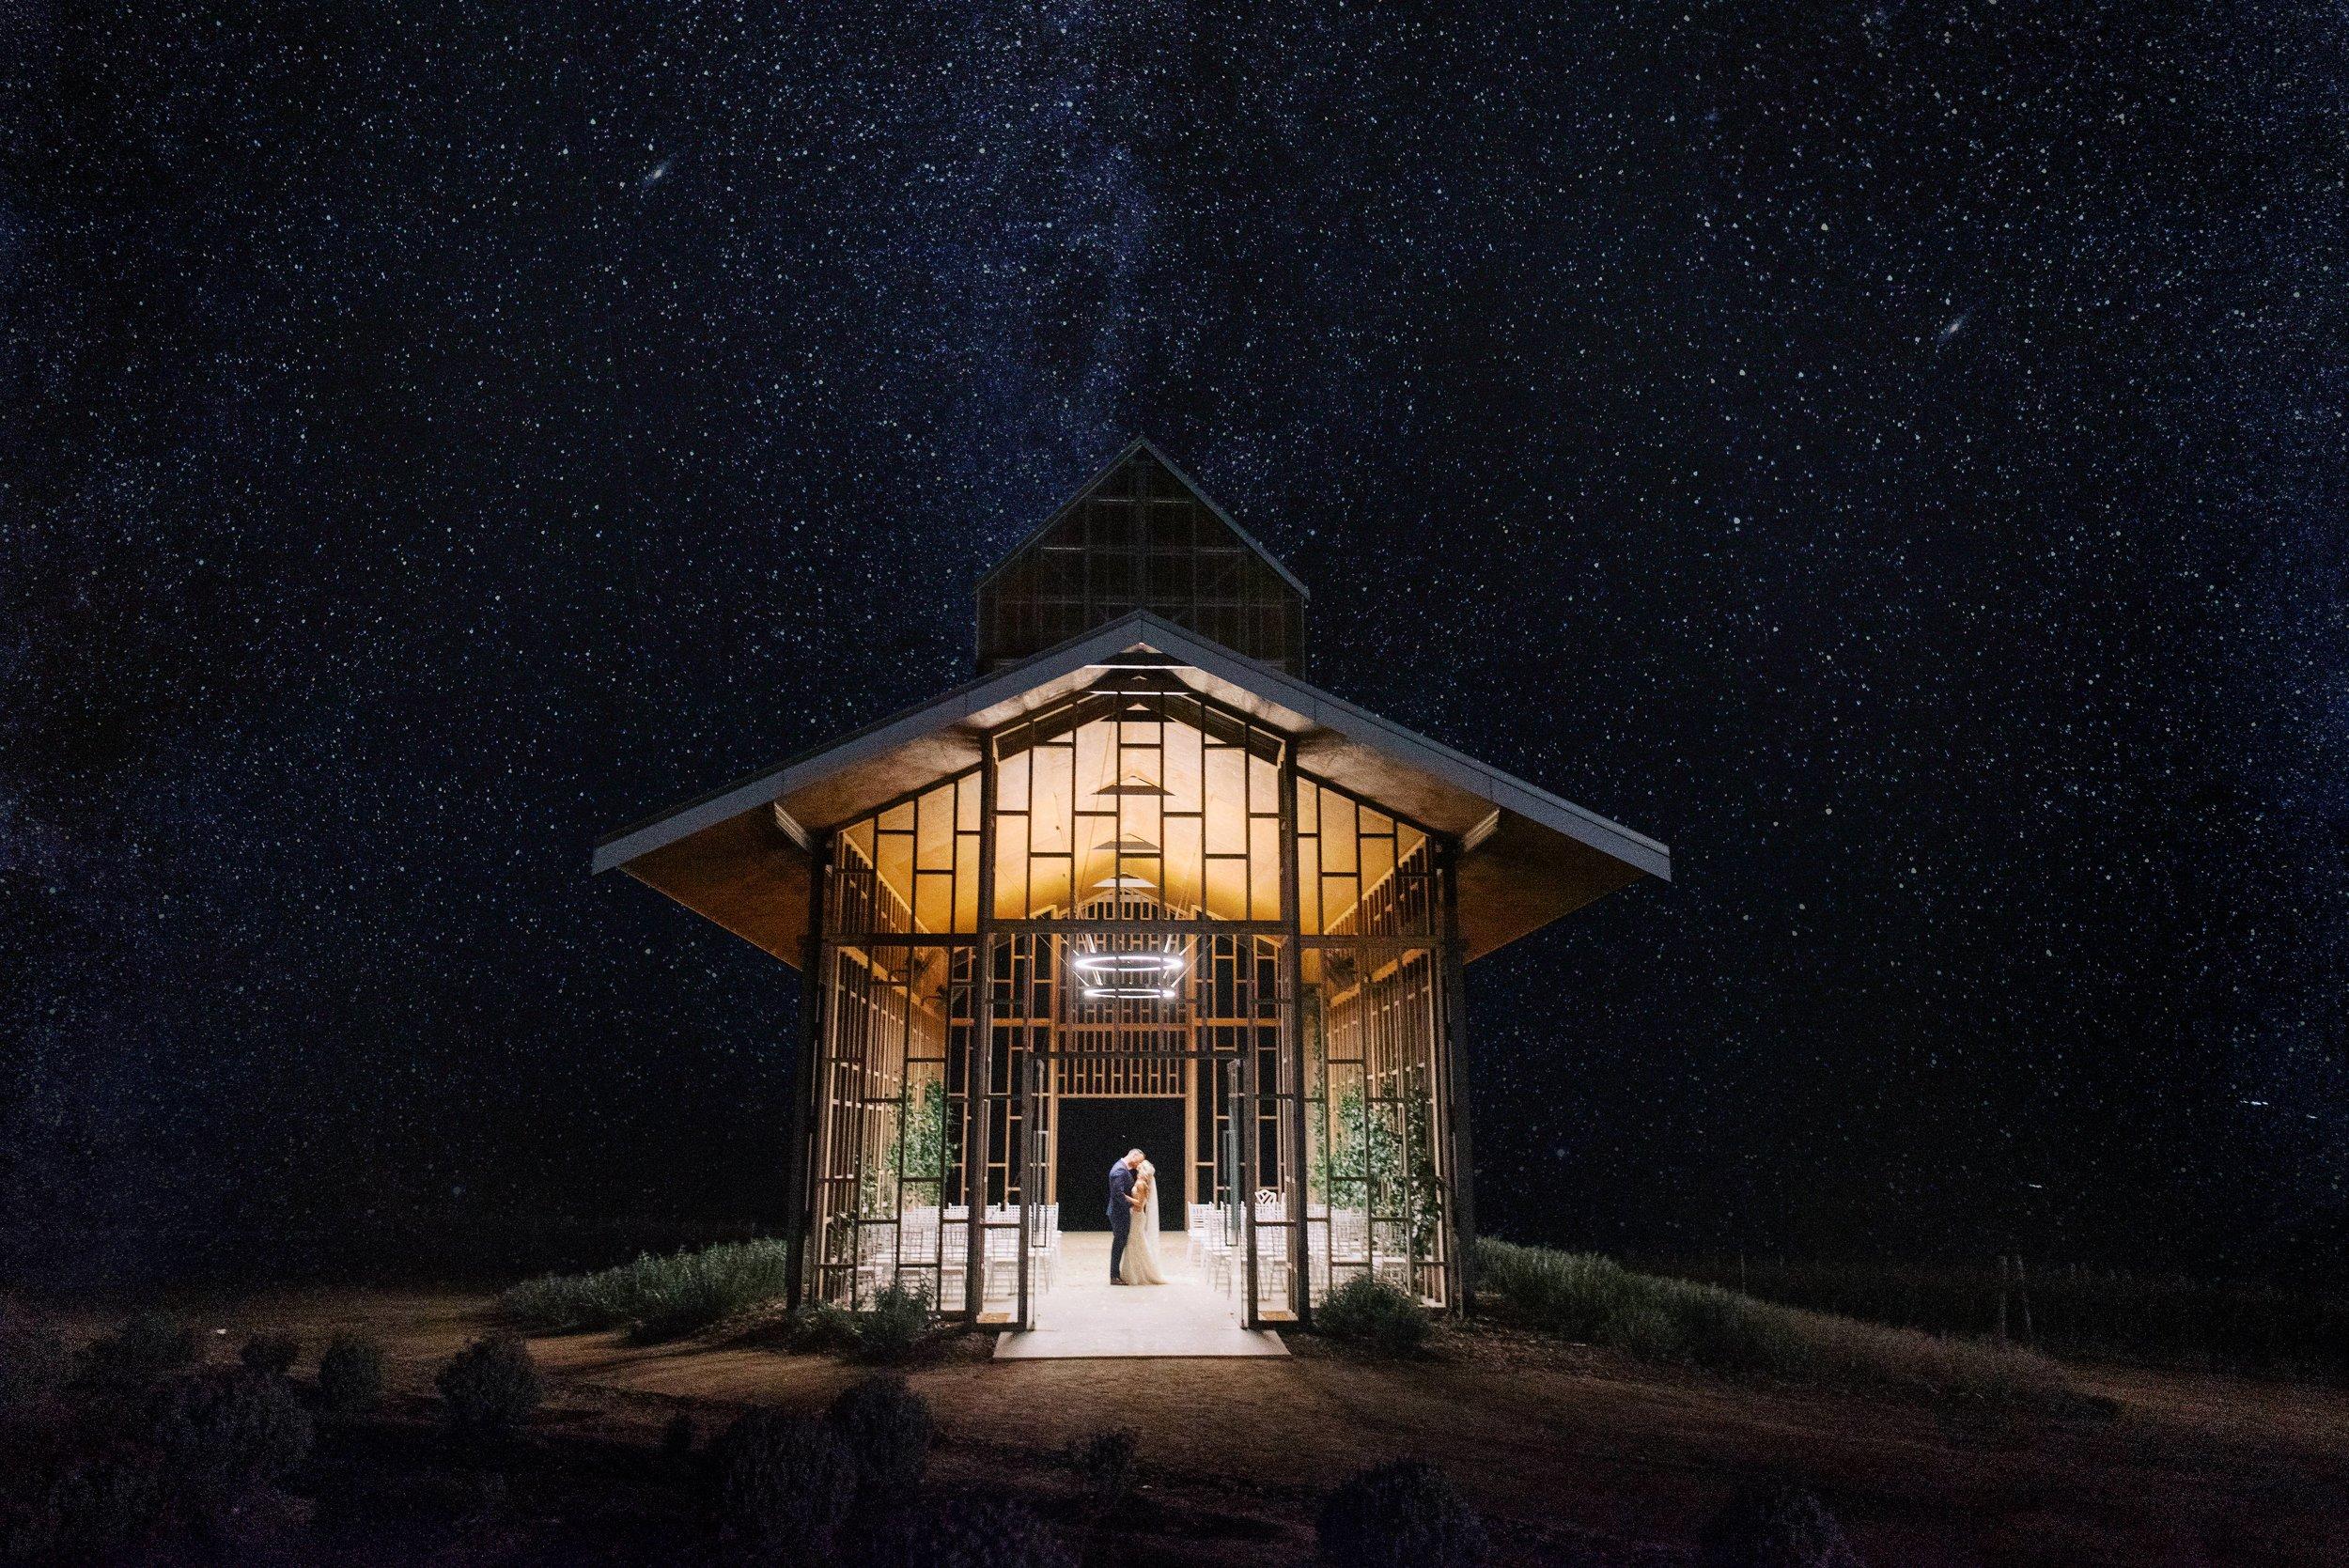 Kooroomba-Vineyard-Lavender-Farm-Wedding-Fine-Art-Lauren-Olivia-105.jpg